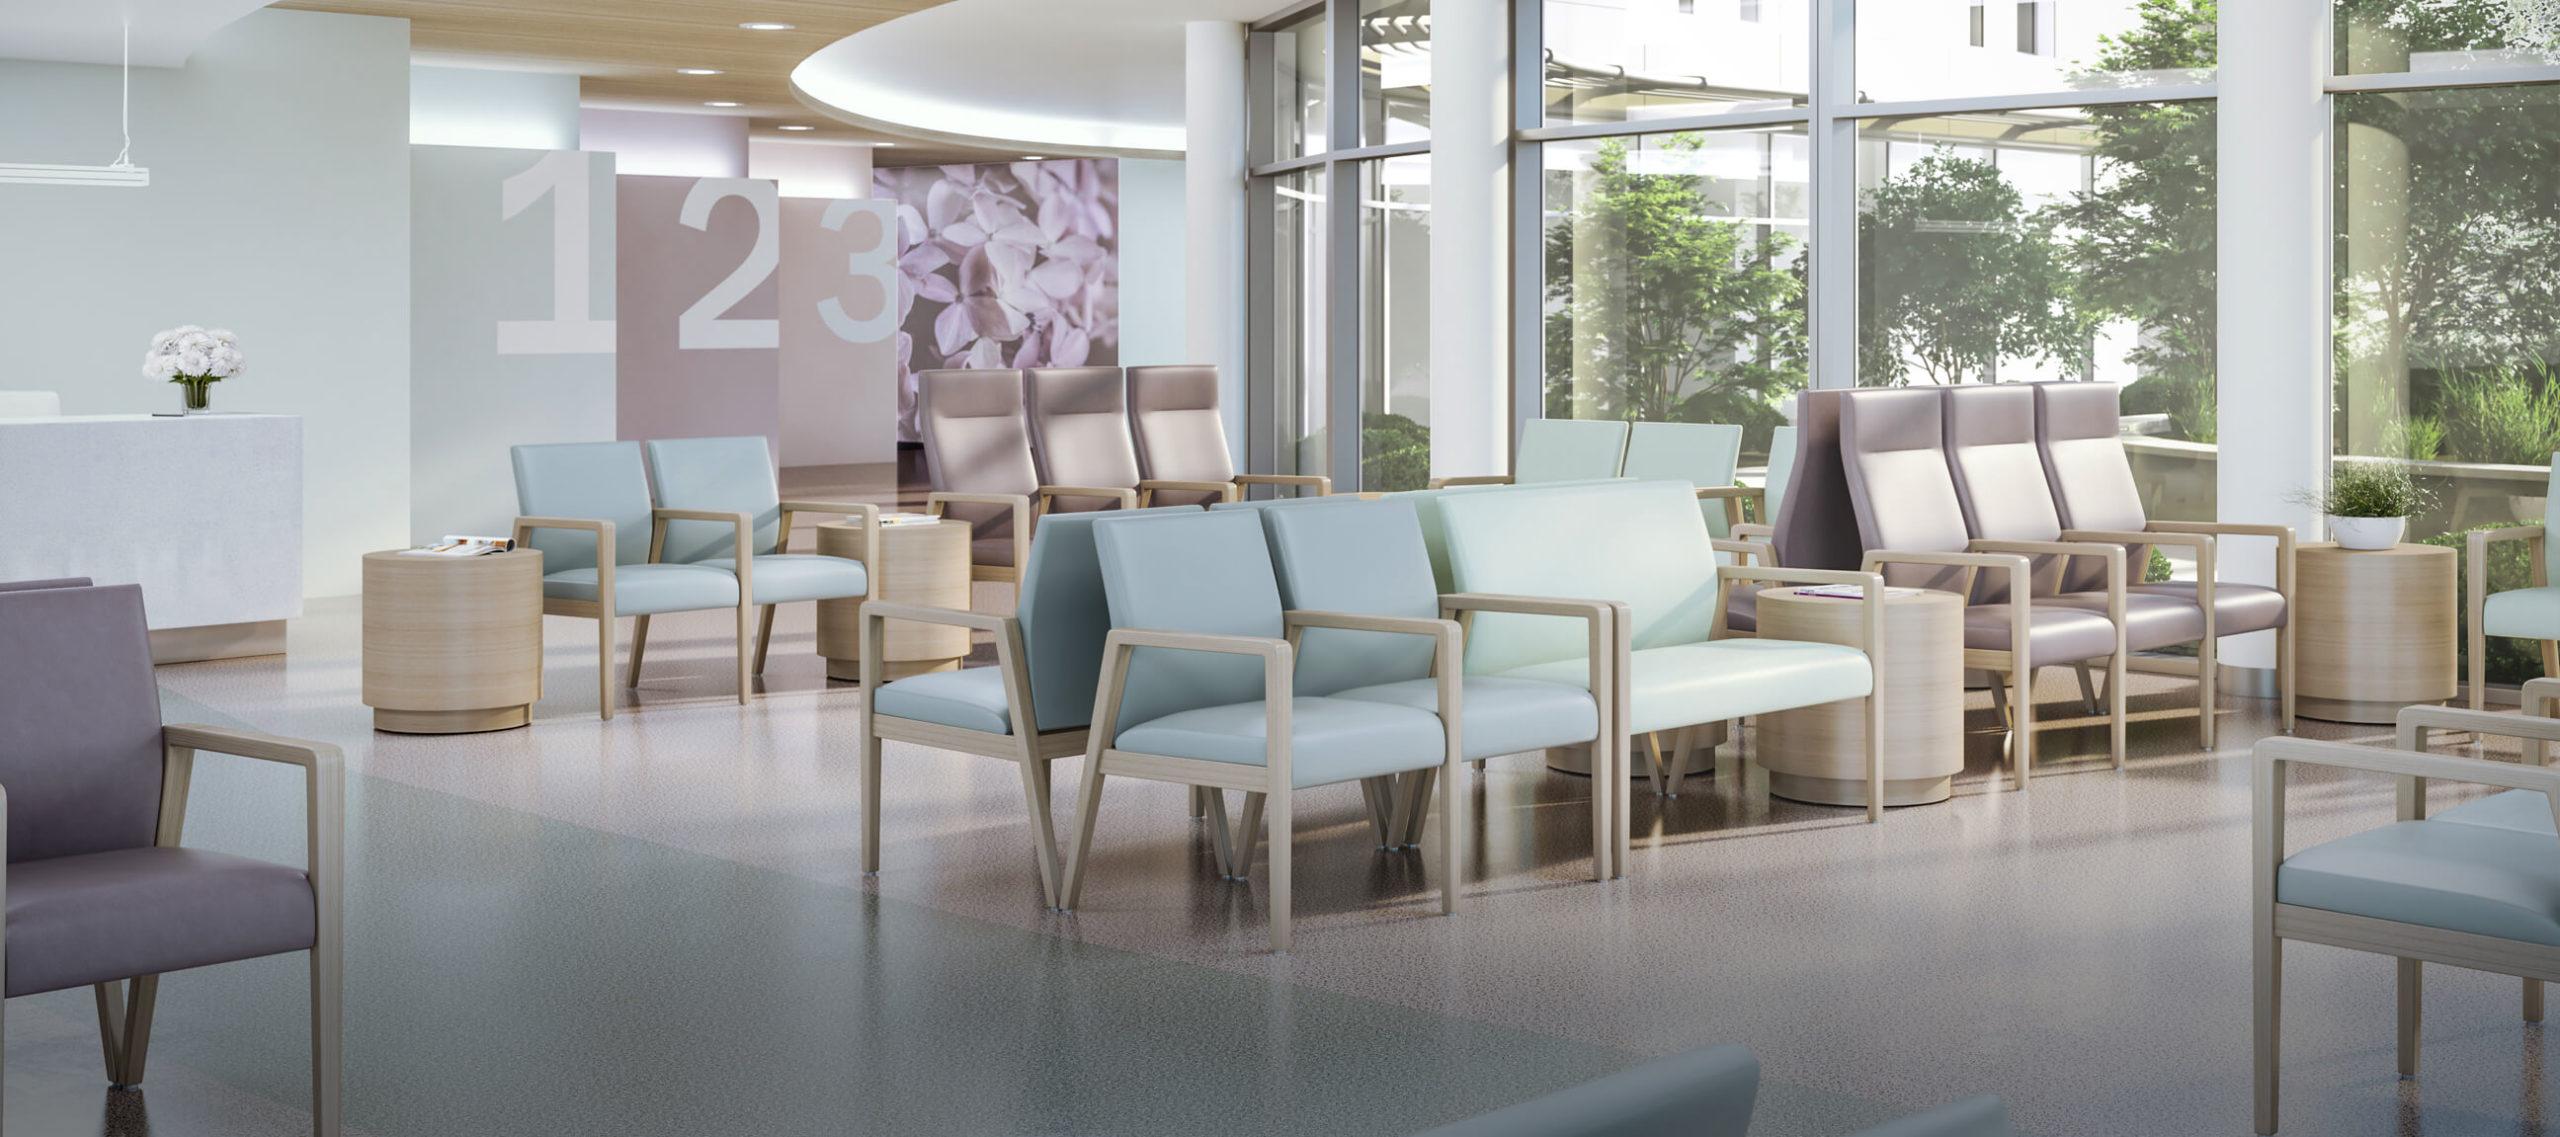 A Breath of Fresh Air: Hospital lobby